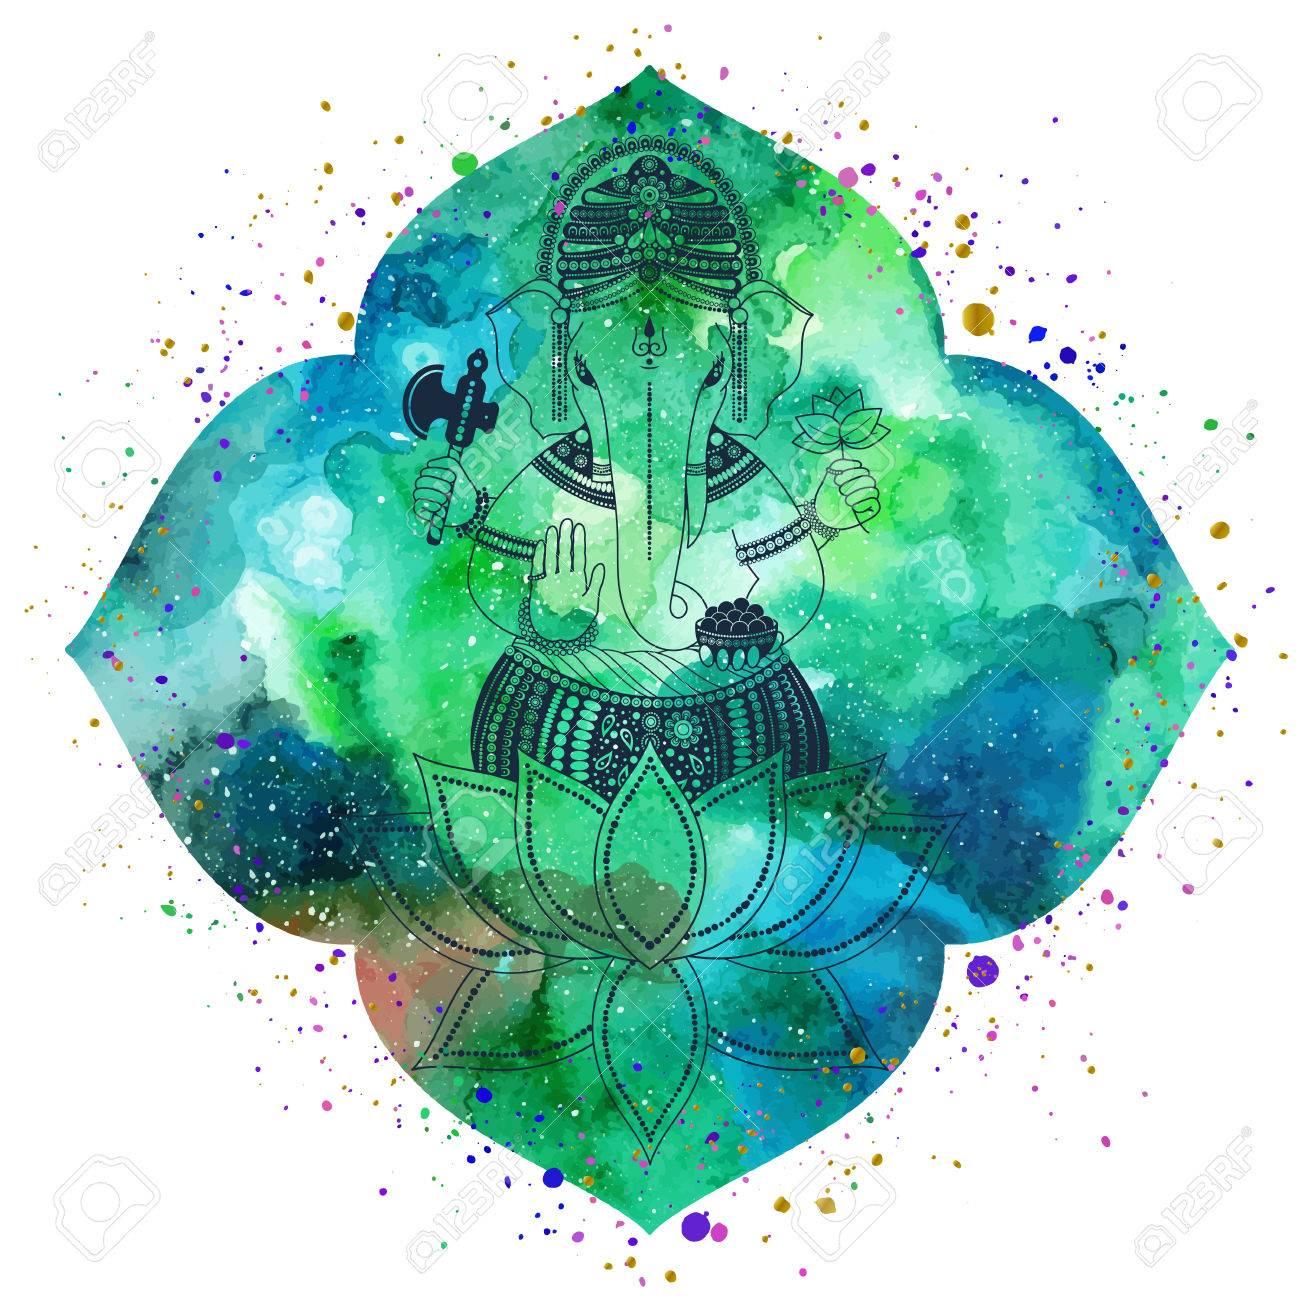 Ganesha Or Ganapati Indian Deity In The Hindu Silhouette On